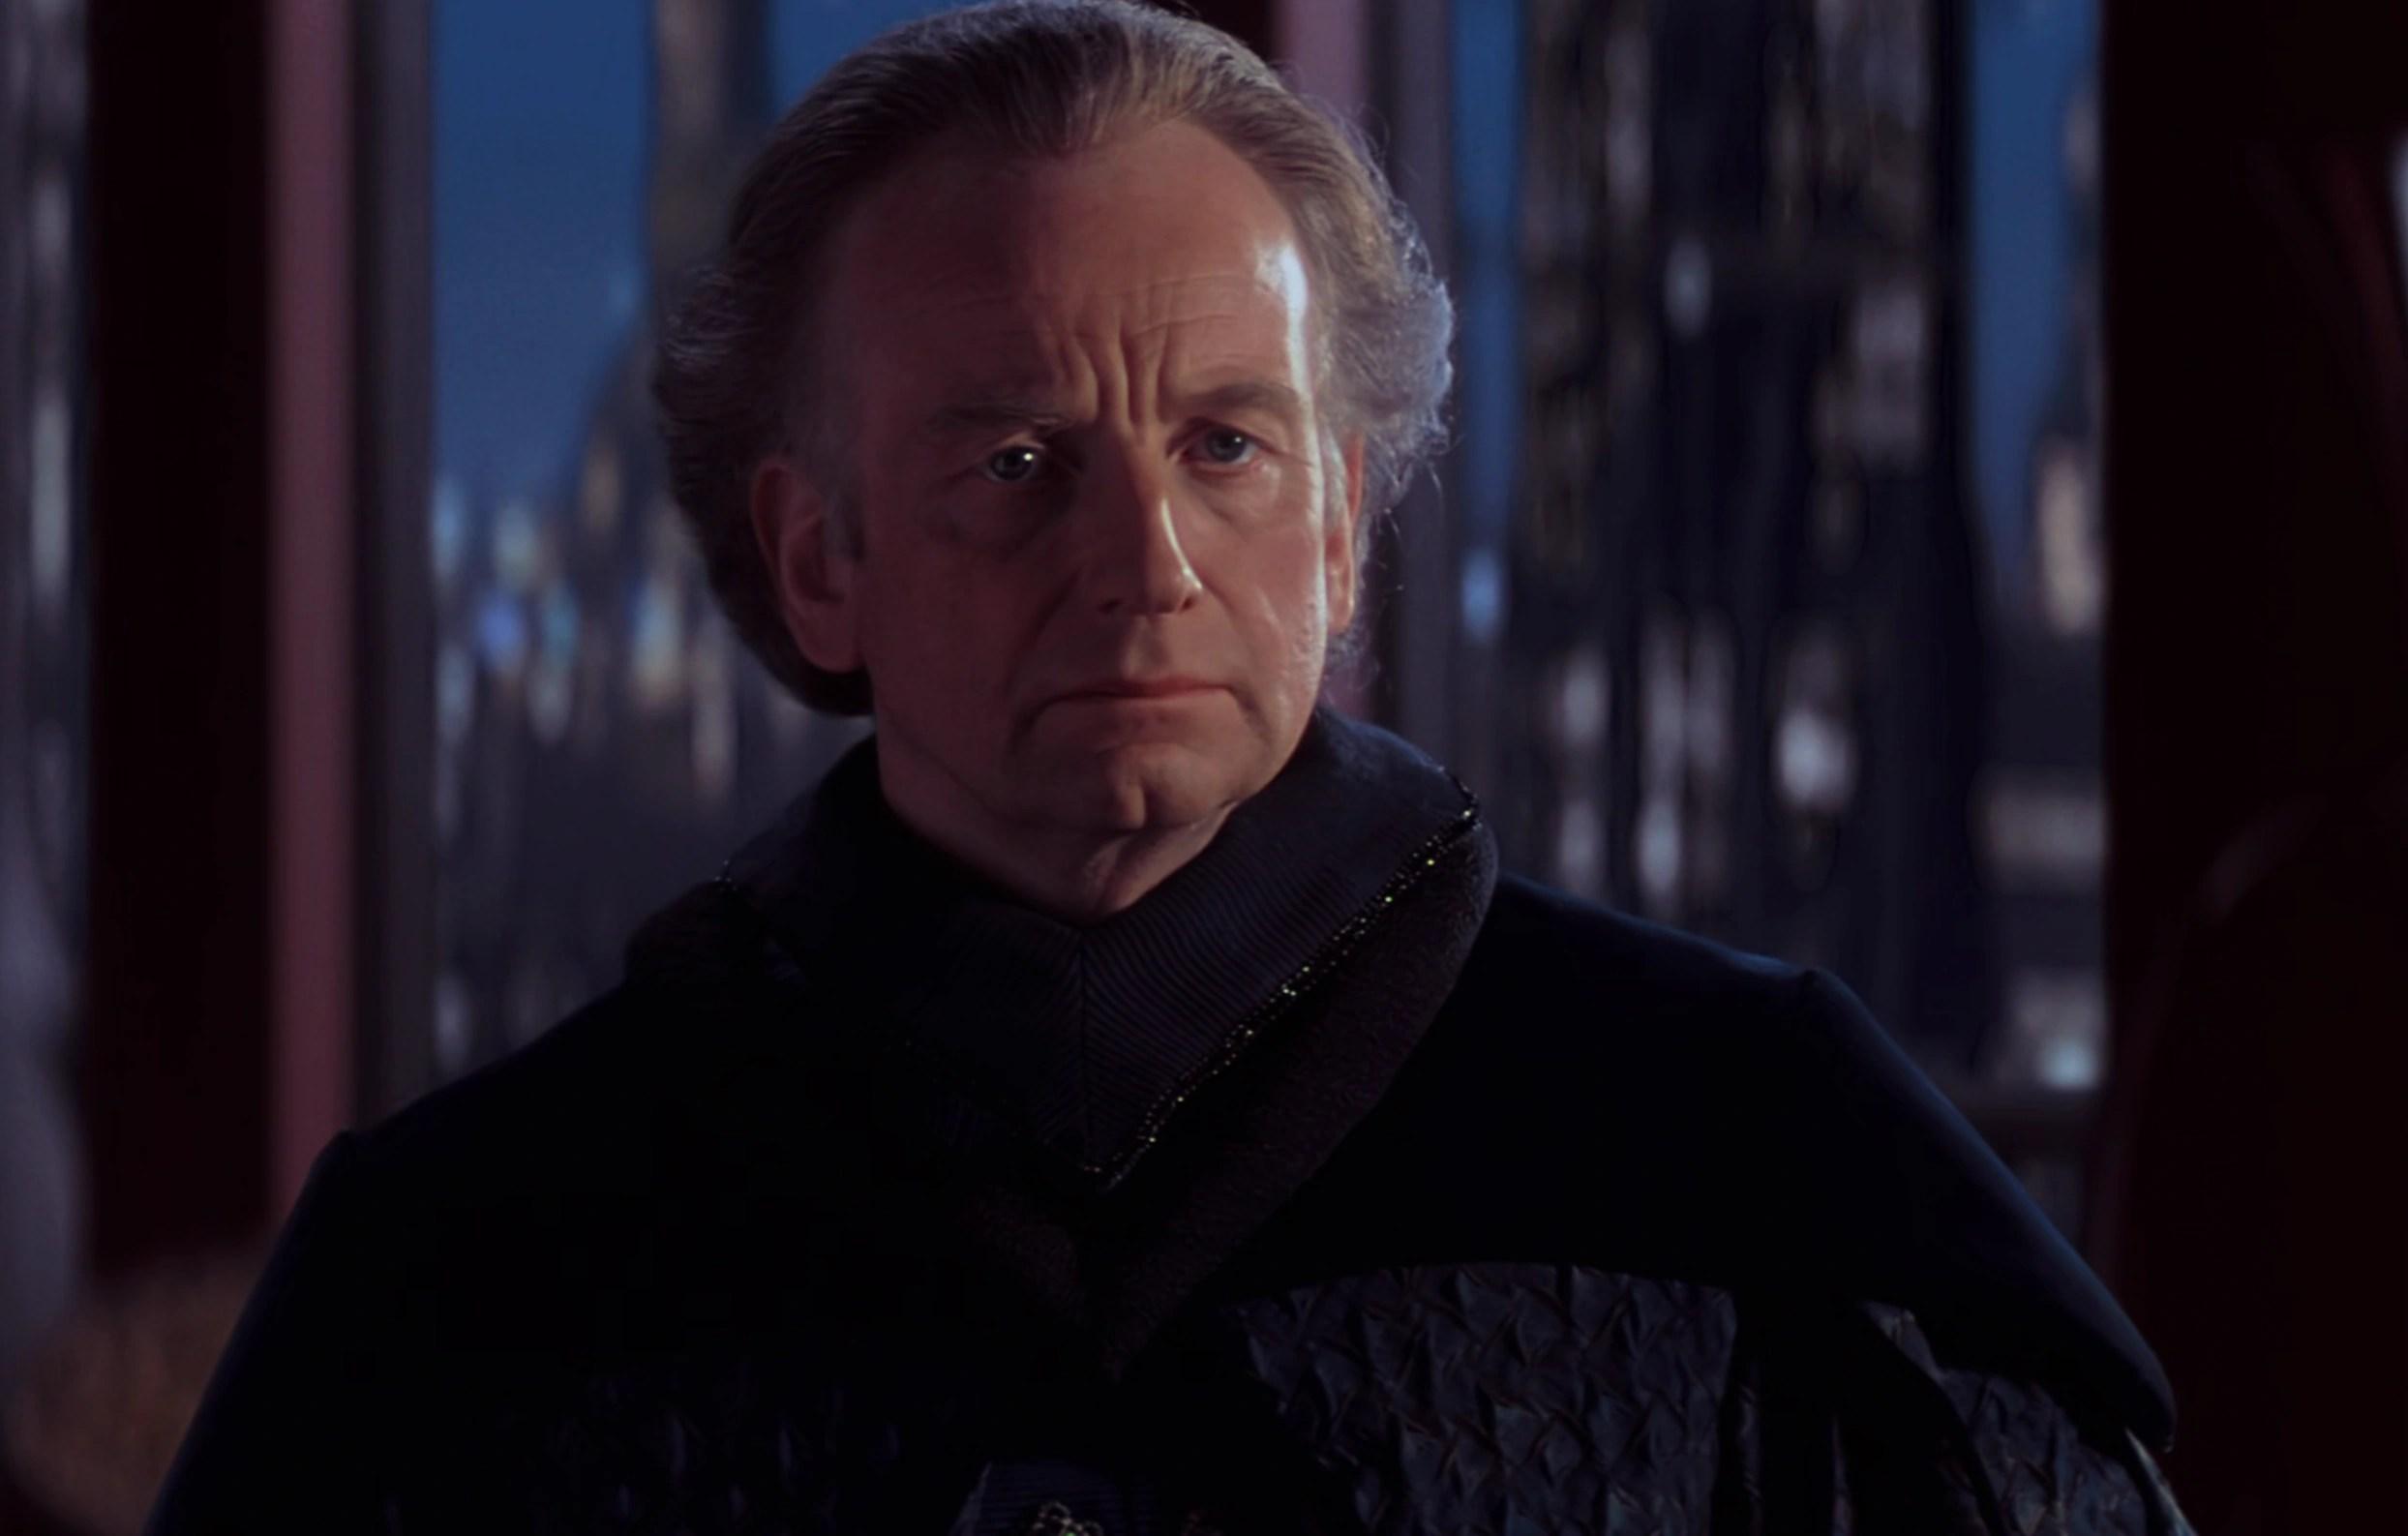 senator palpatine, emperor palpatine, darth sidious, sith lord, clone wars sith